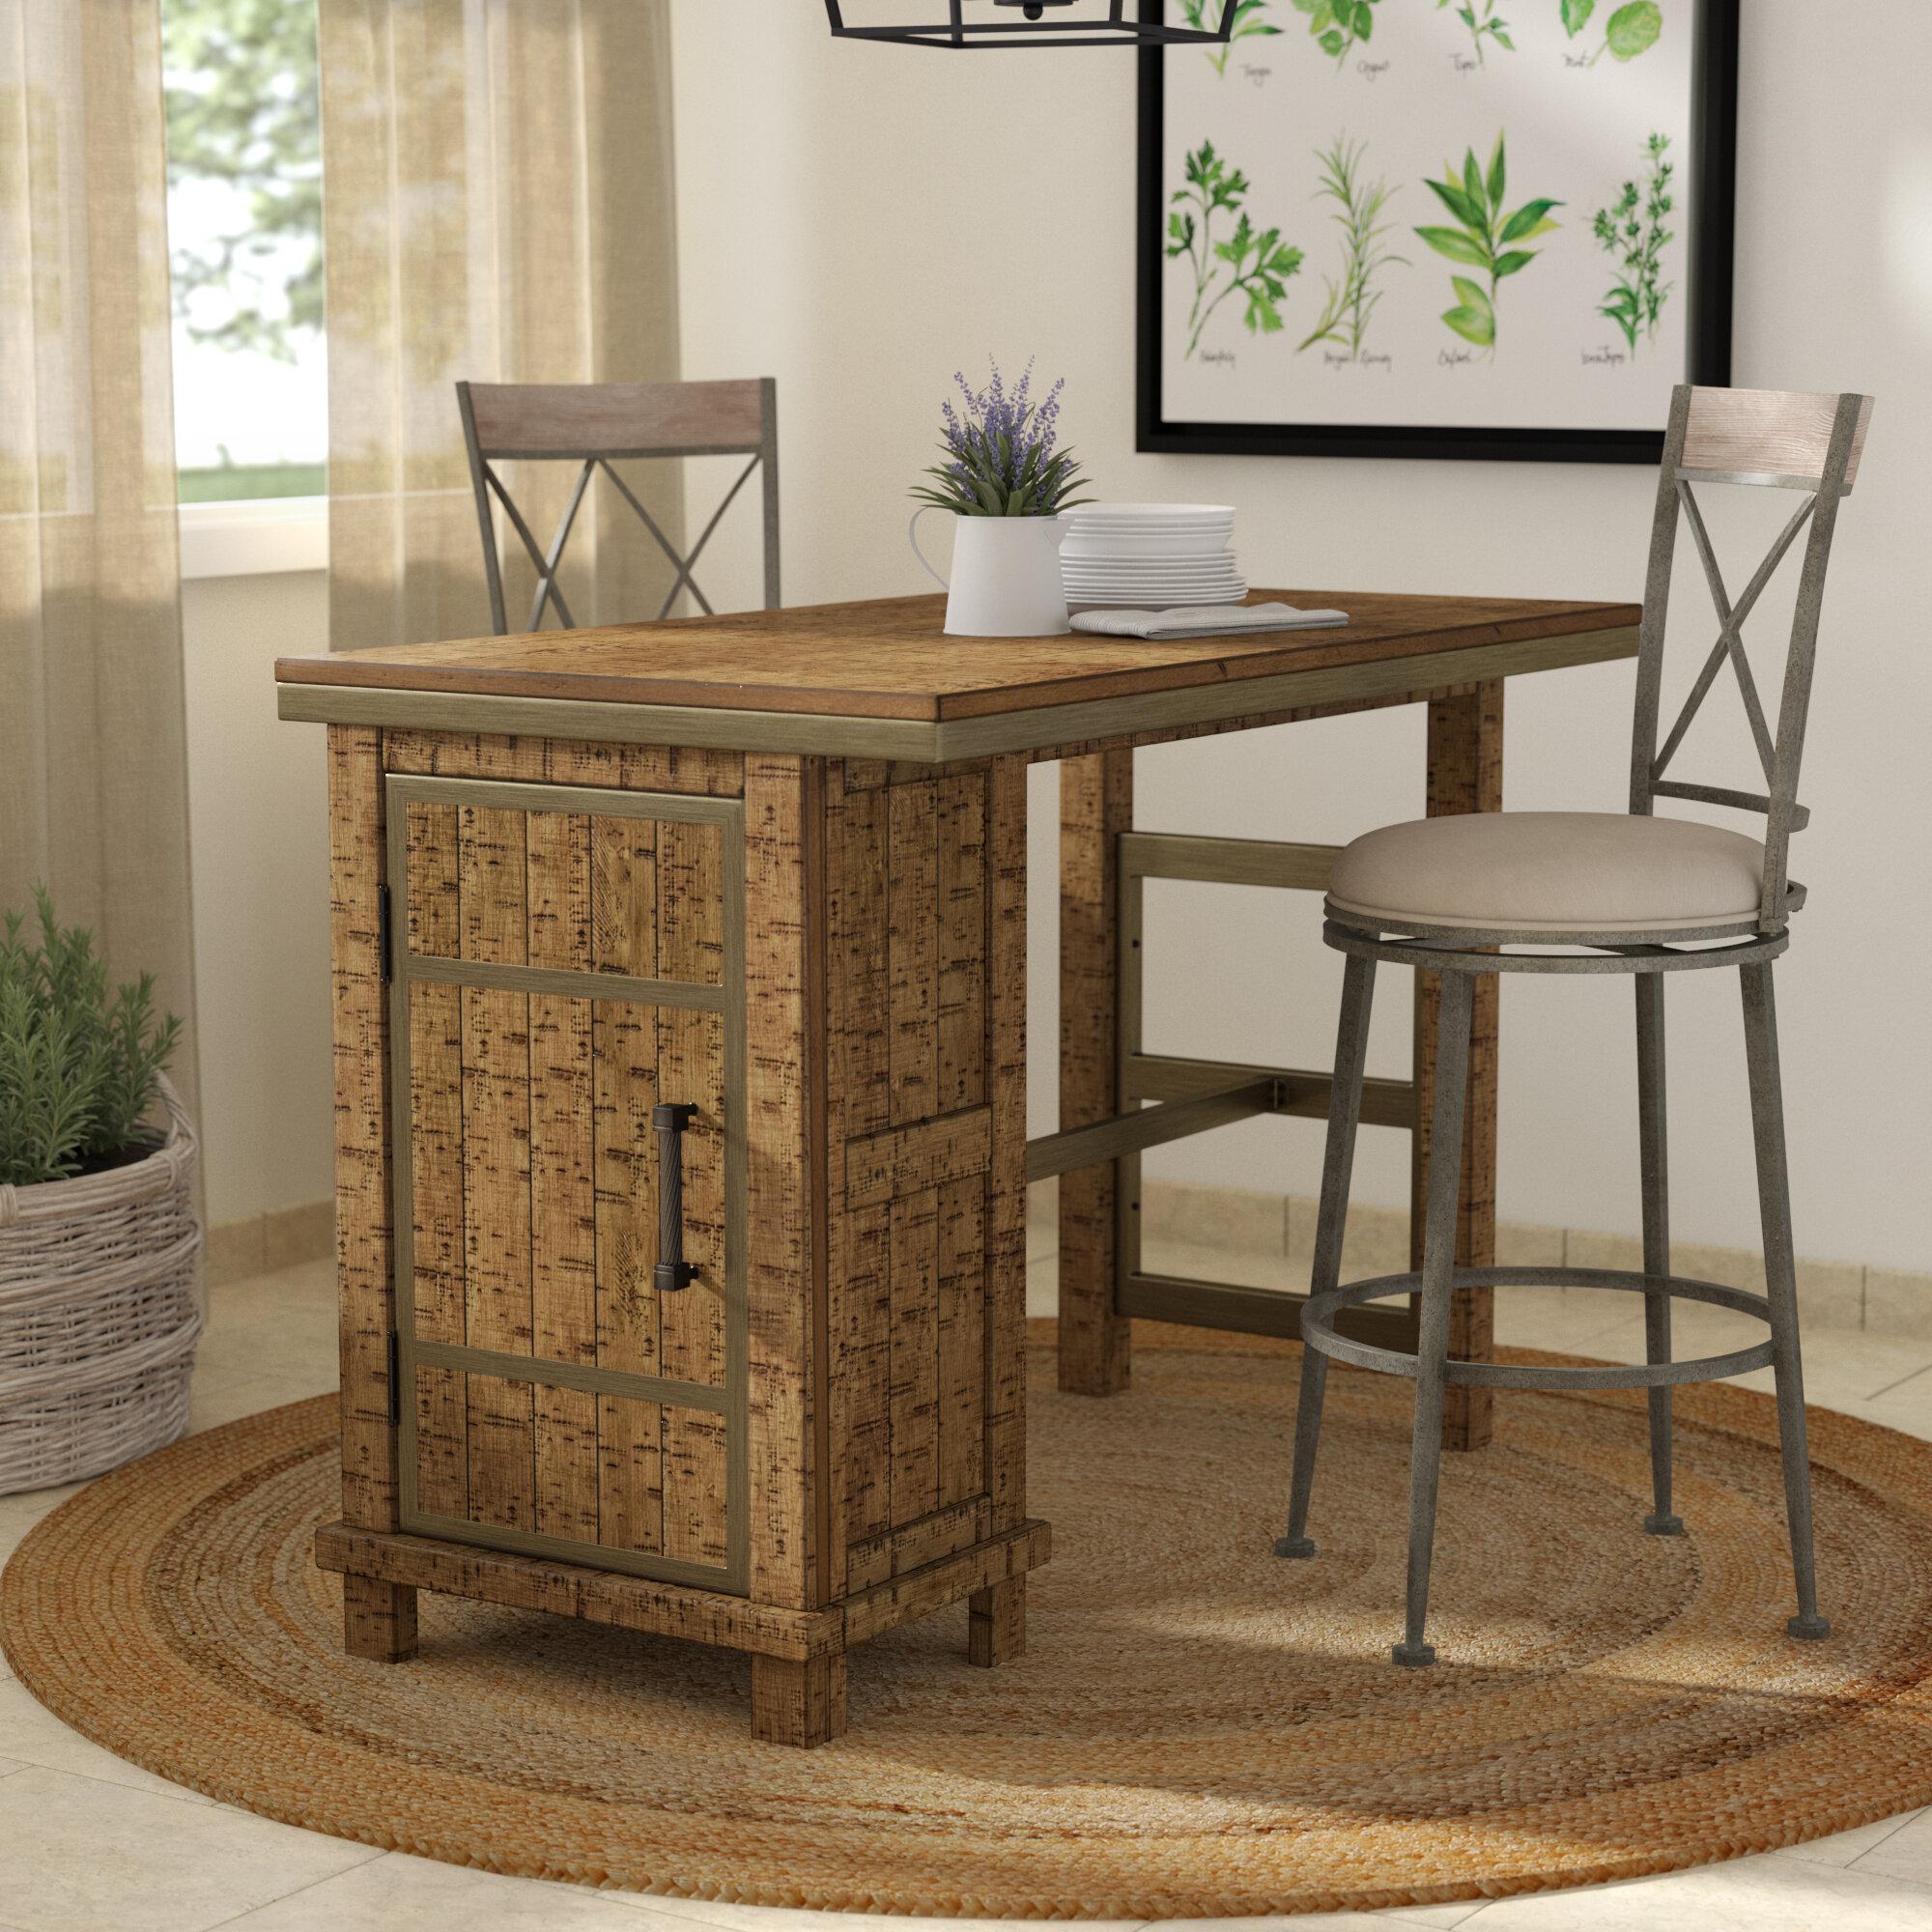 Laurel foundry modern farmhouse desjardins rectangular counter height dining table with storage reviews wayfair